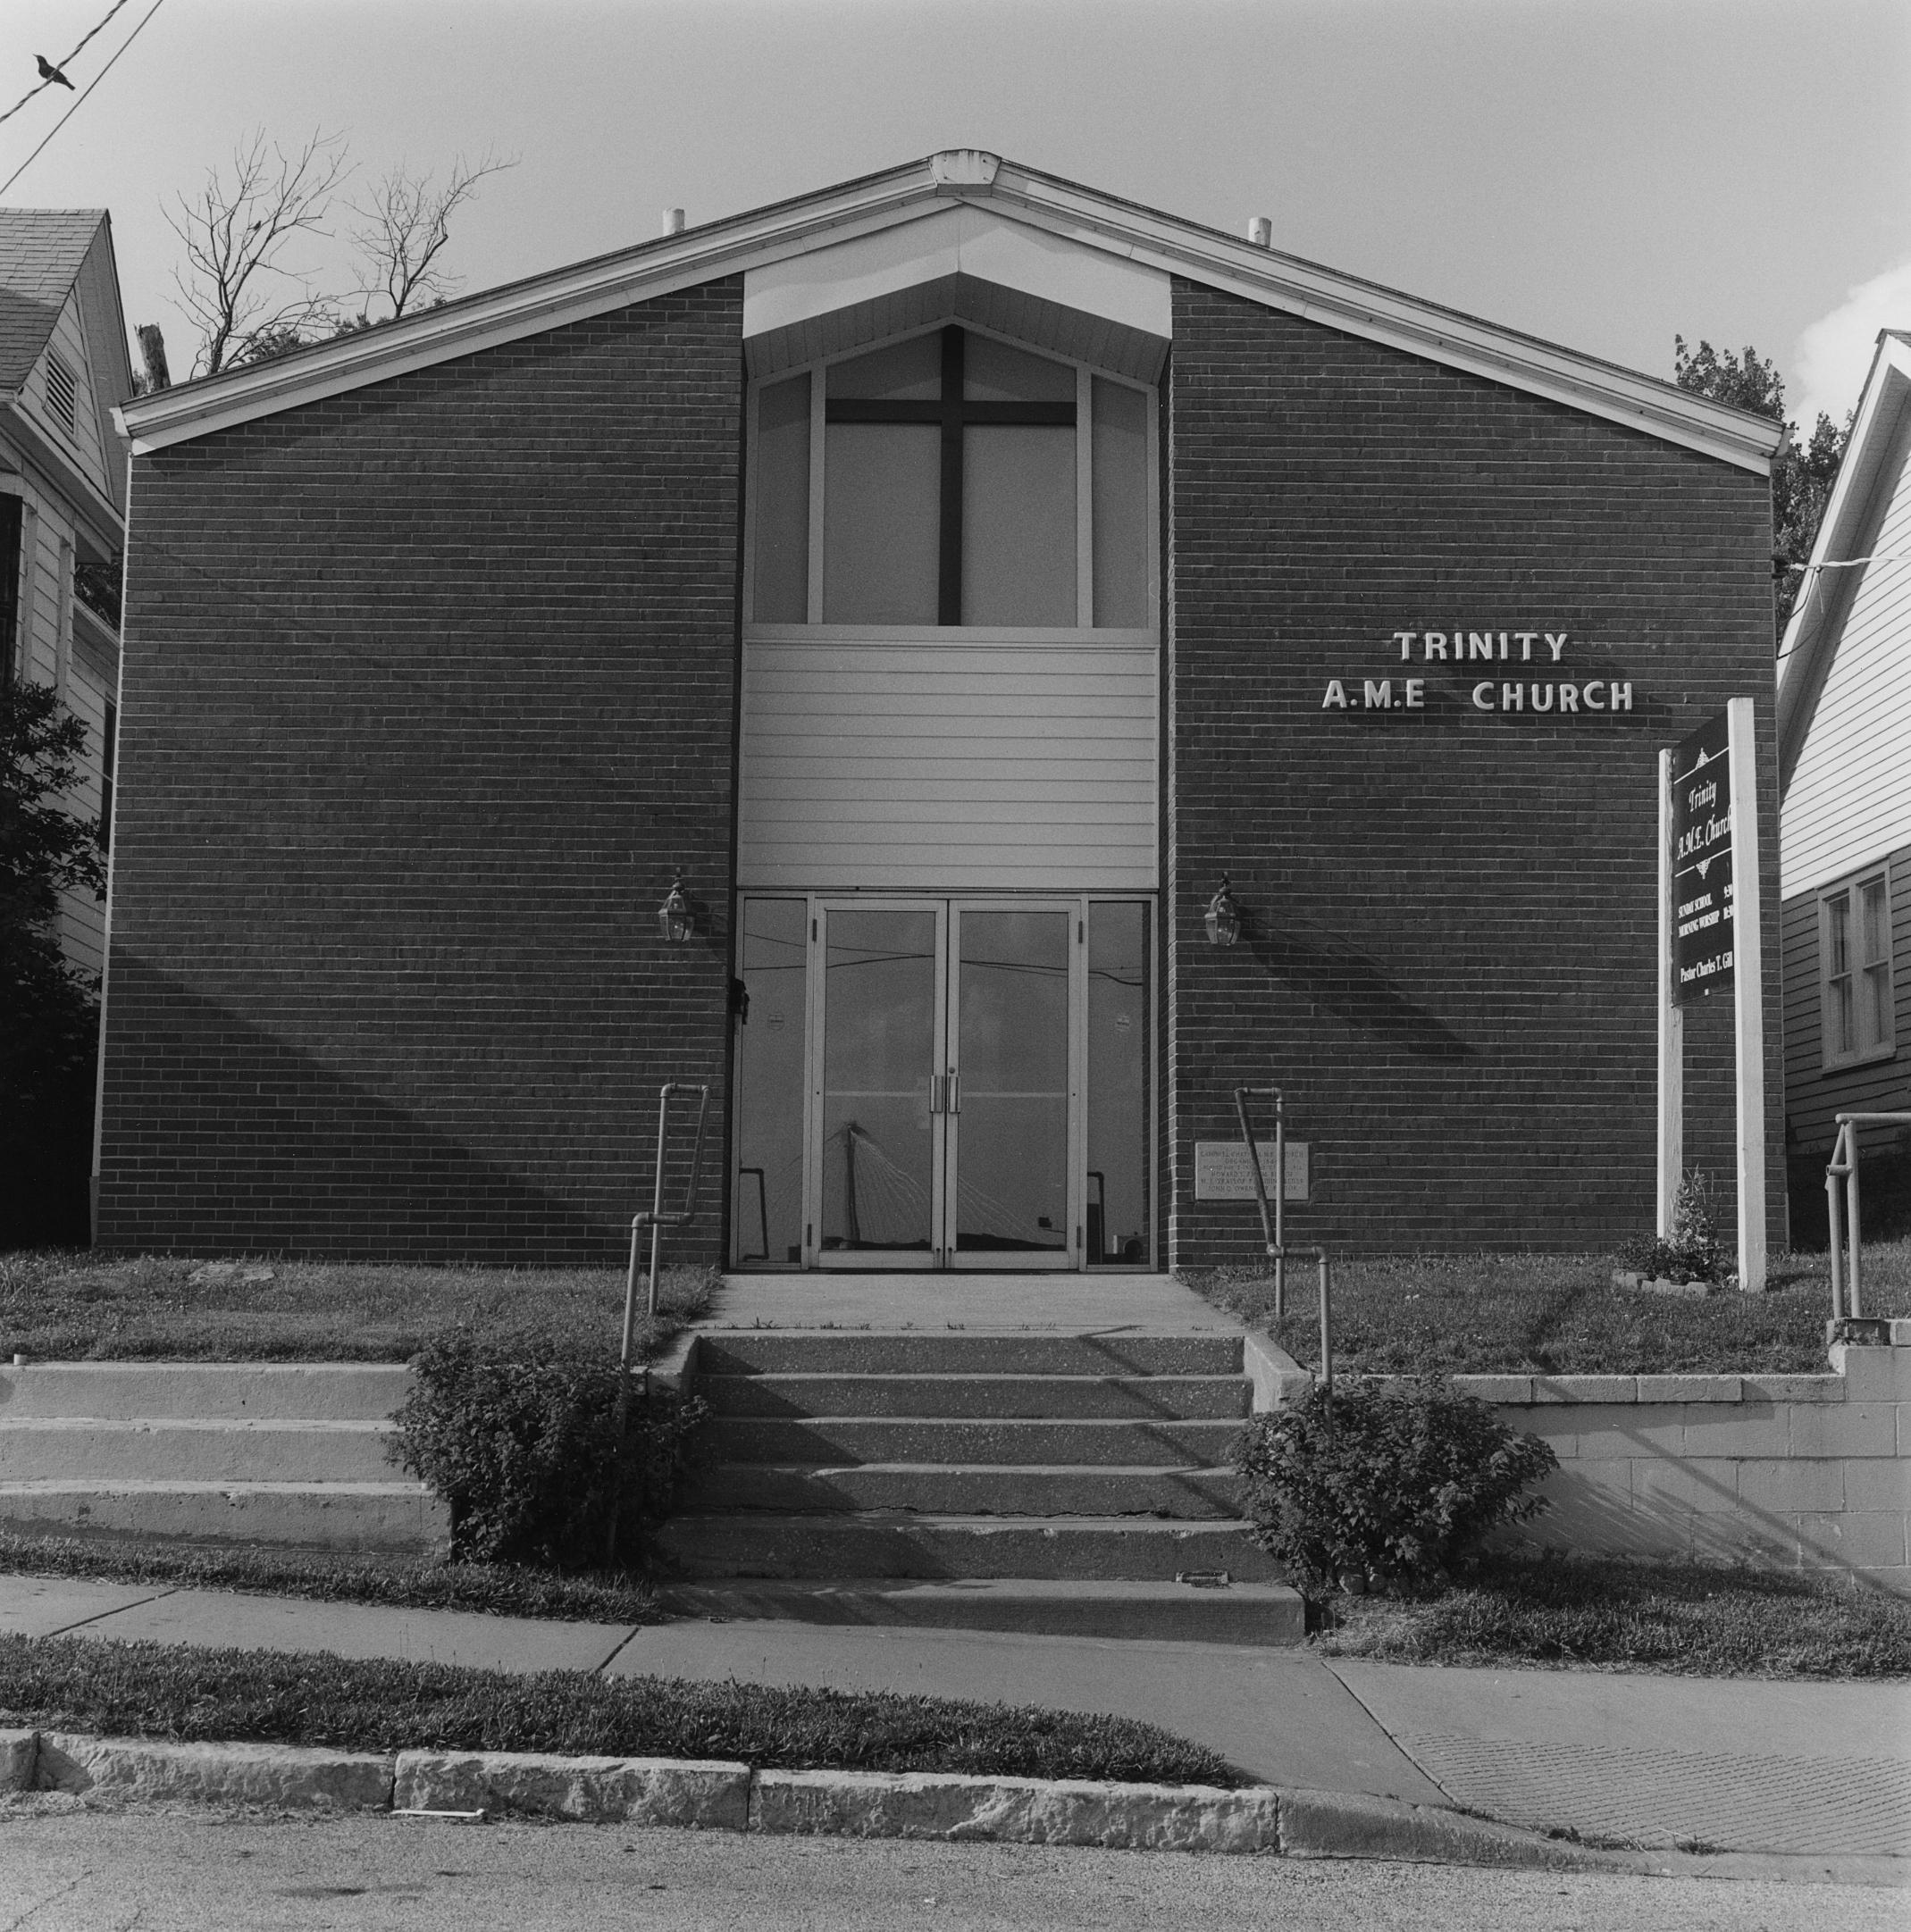 Trinity A.M.E. Church, Alton, Illinois, 2010